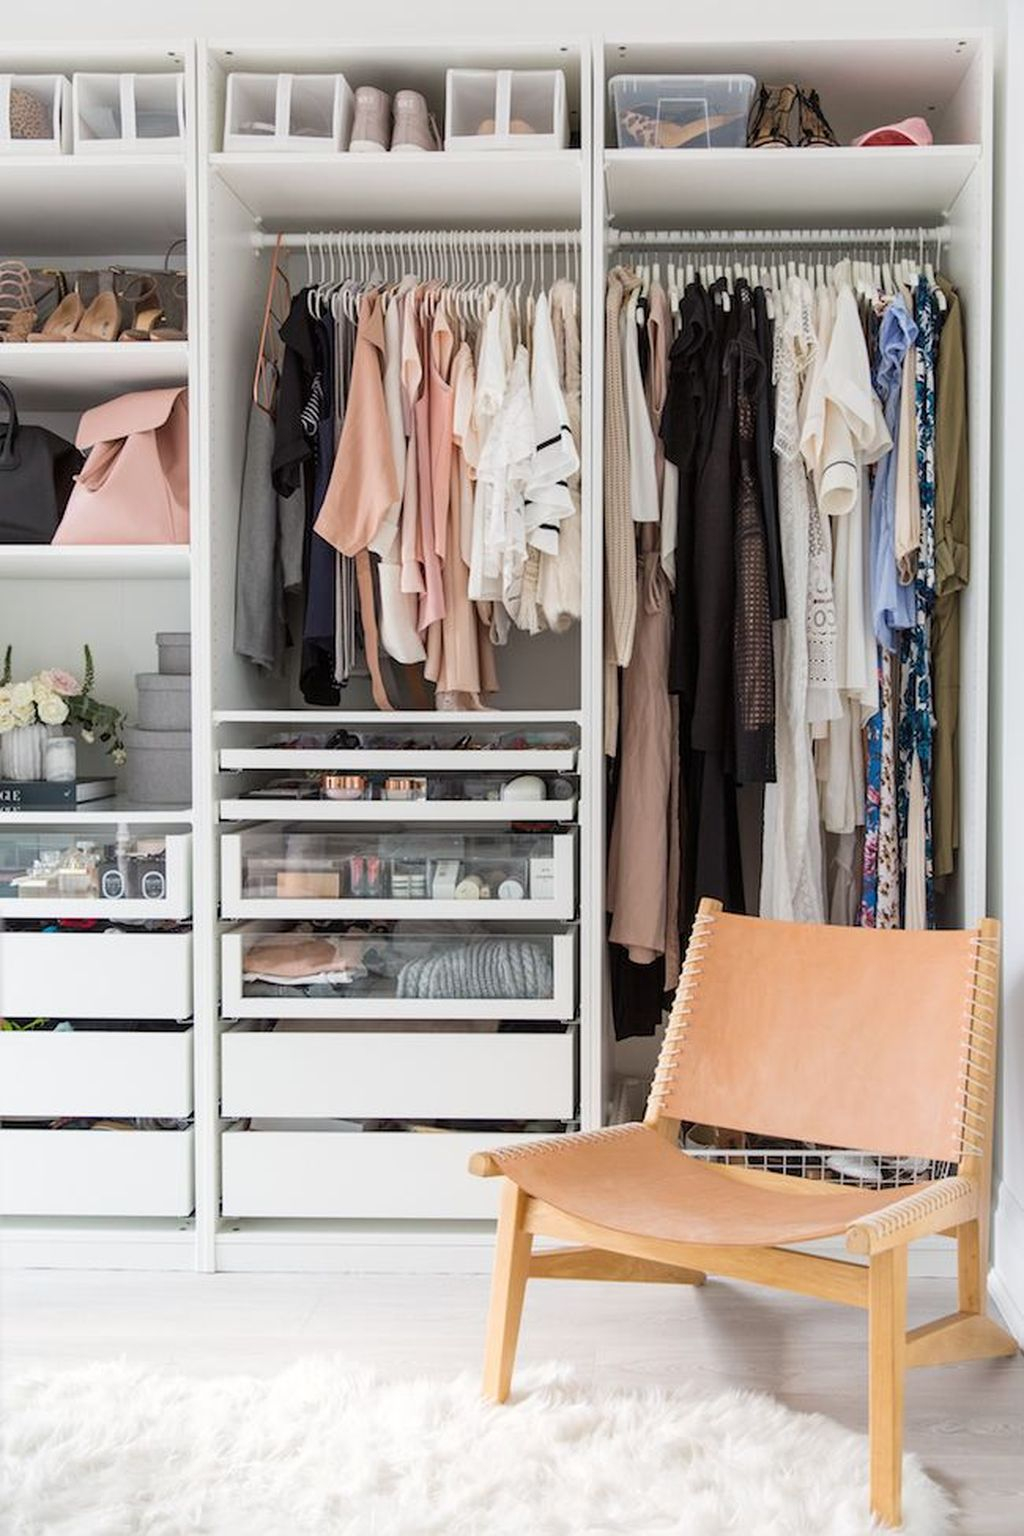 Rustic Wardrobe Design Ideas That Is In Trend 40